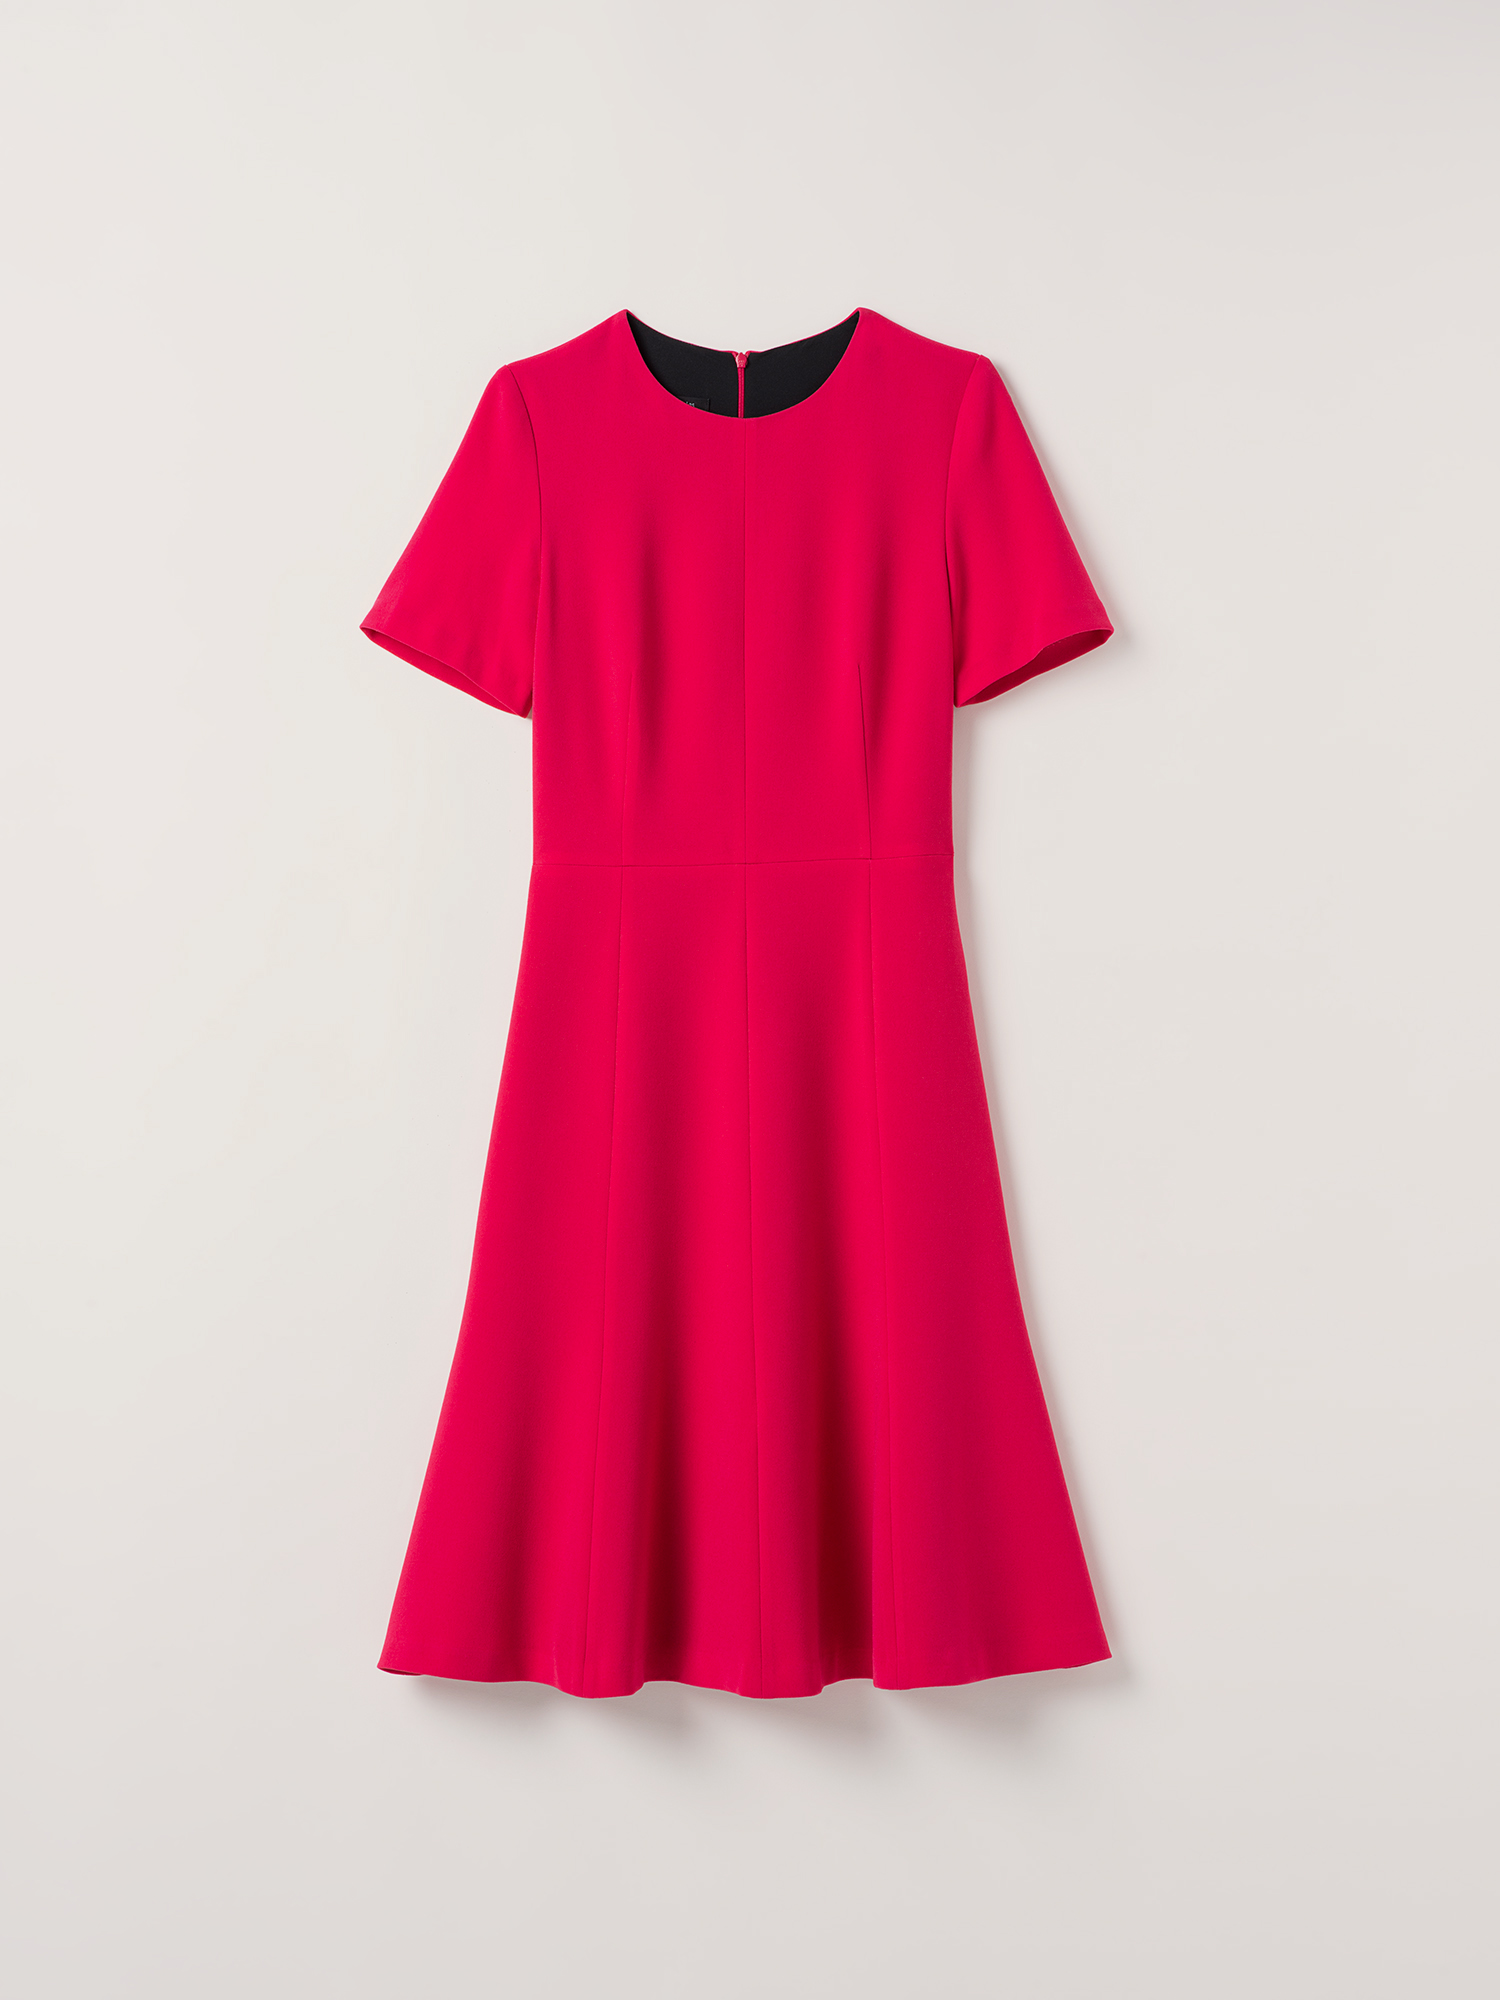 luton-dress_300-5345_fuscia_hero_1-4.jpg